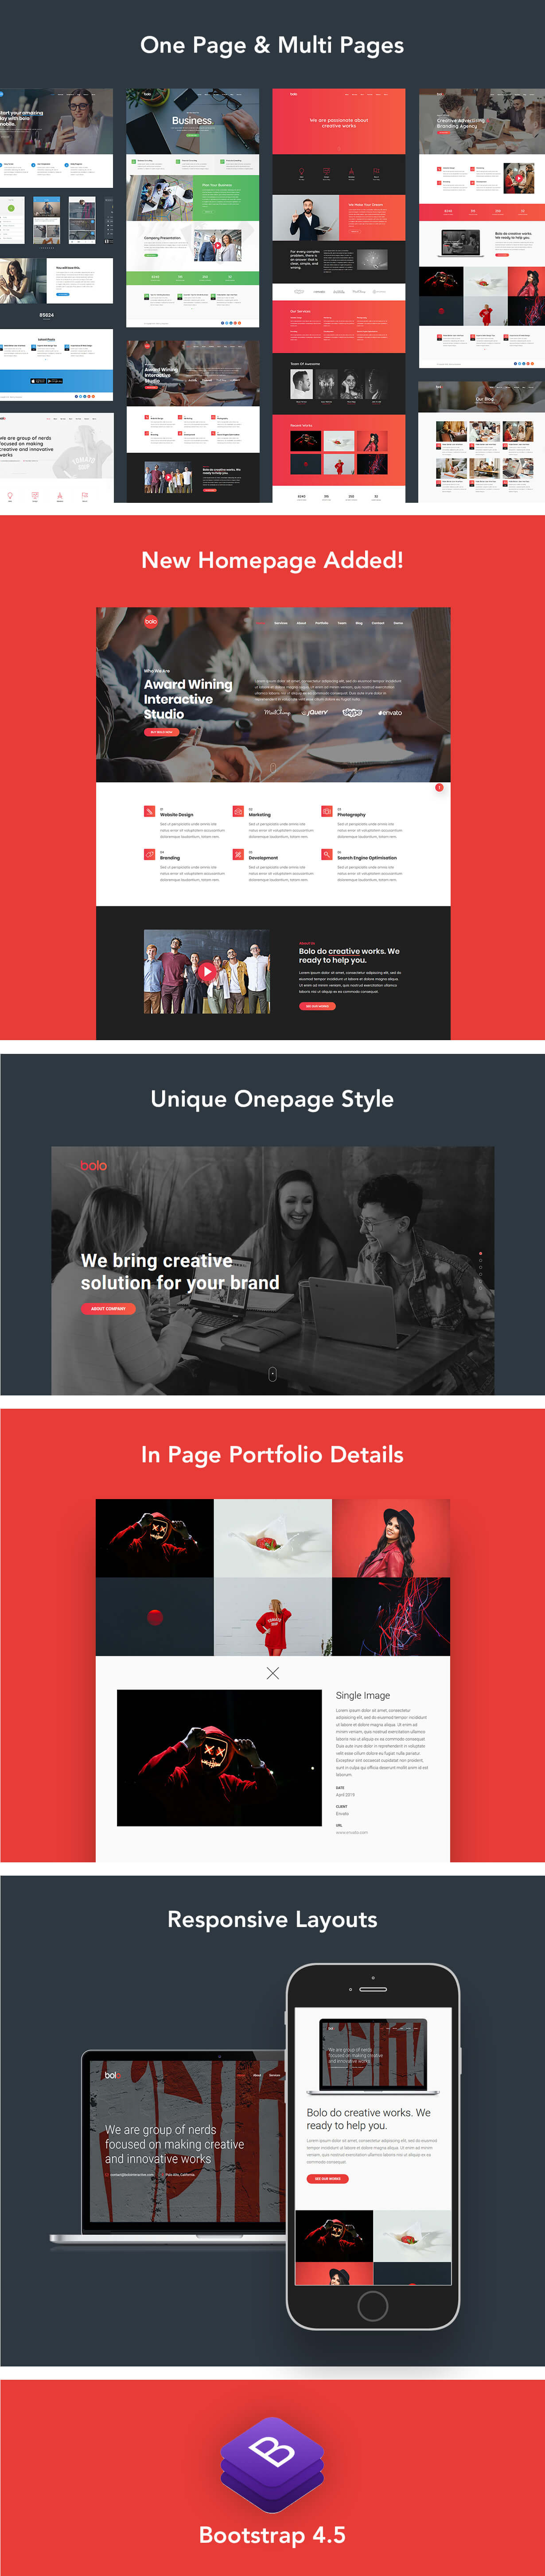 Bolo - One Page Creative Multipurpose Website Template - 1